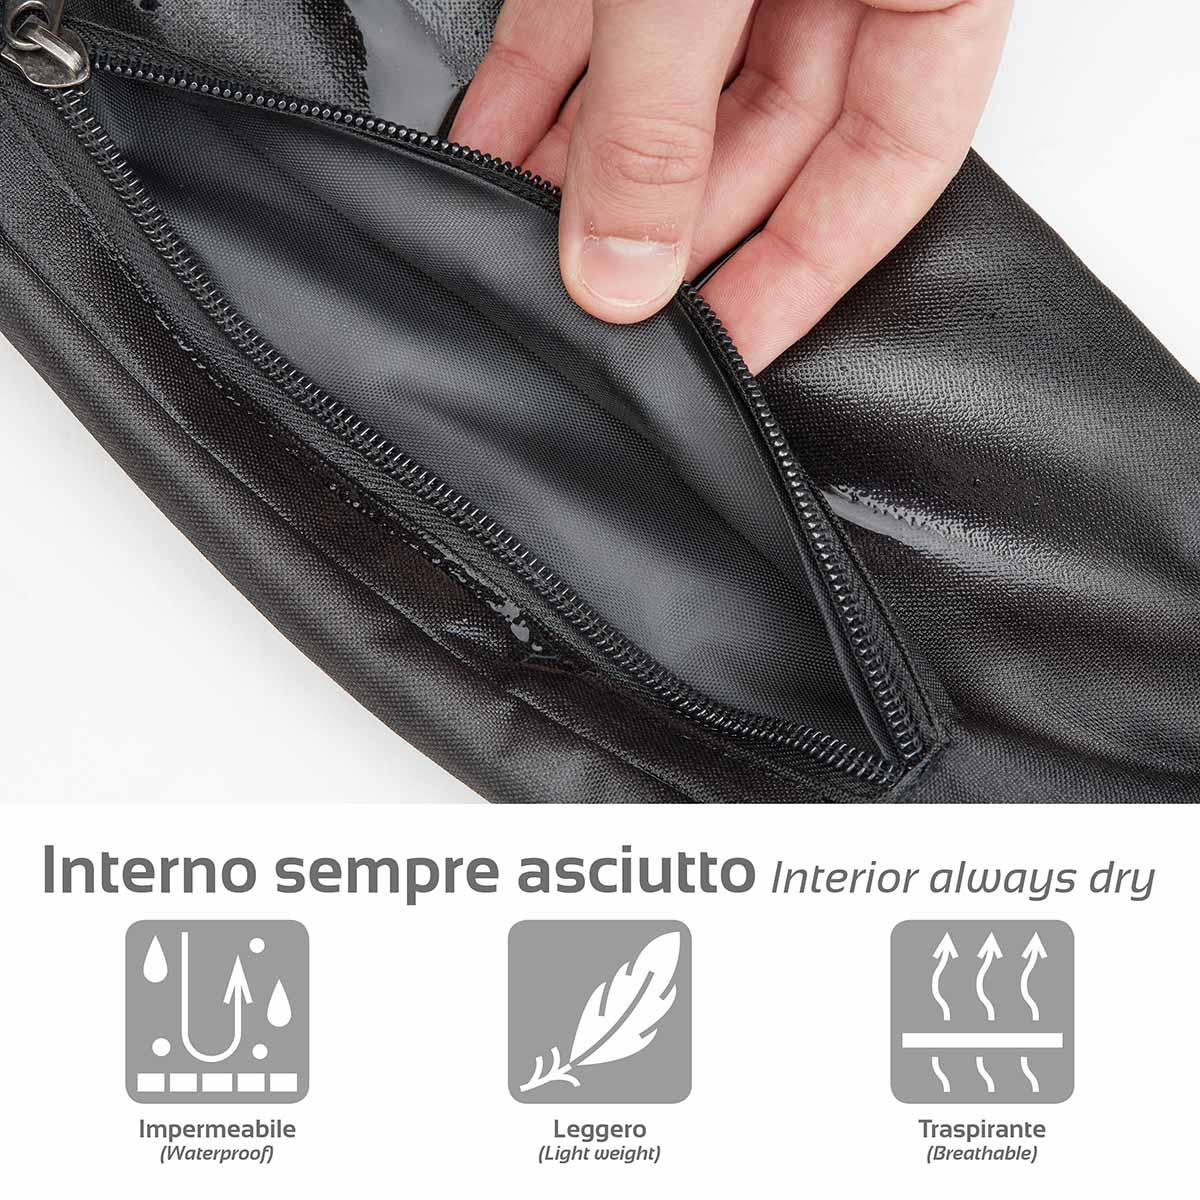 Federico_Balmas_Fotografo_ eCommerce_Amazon_Torino